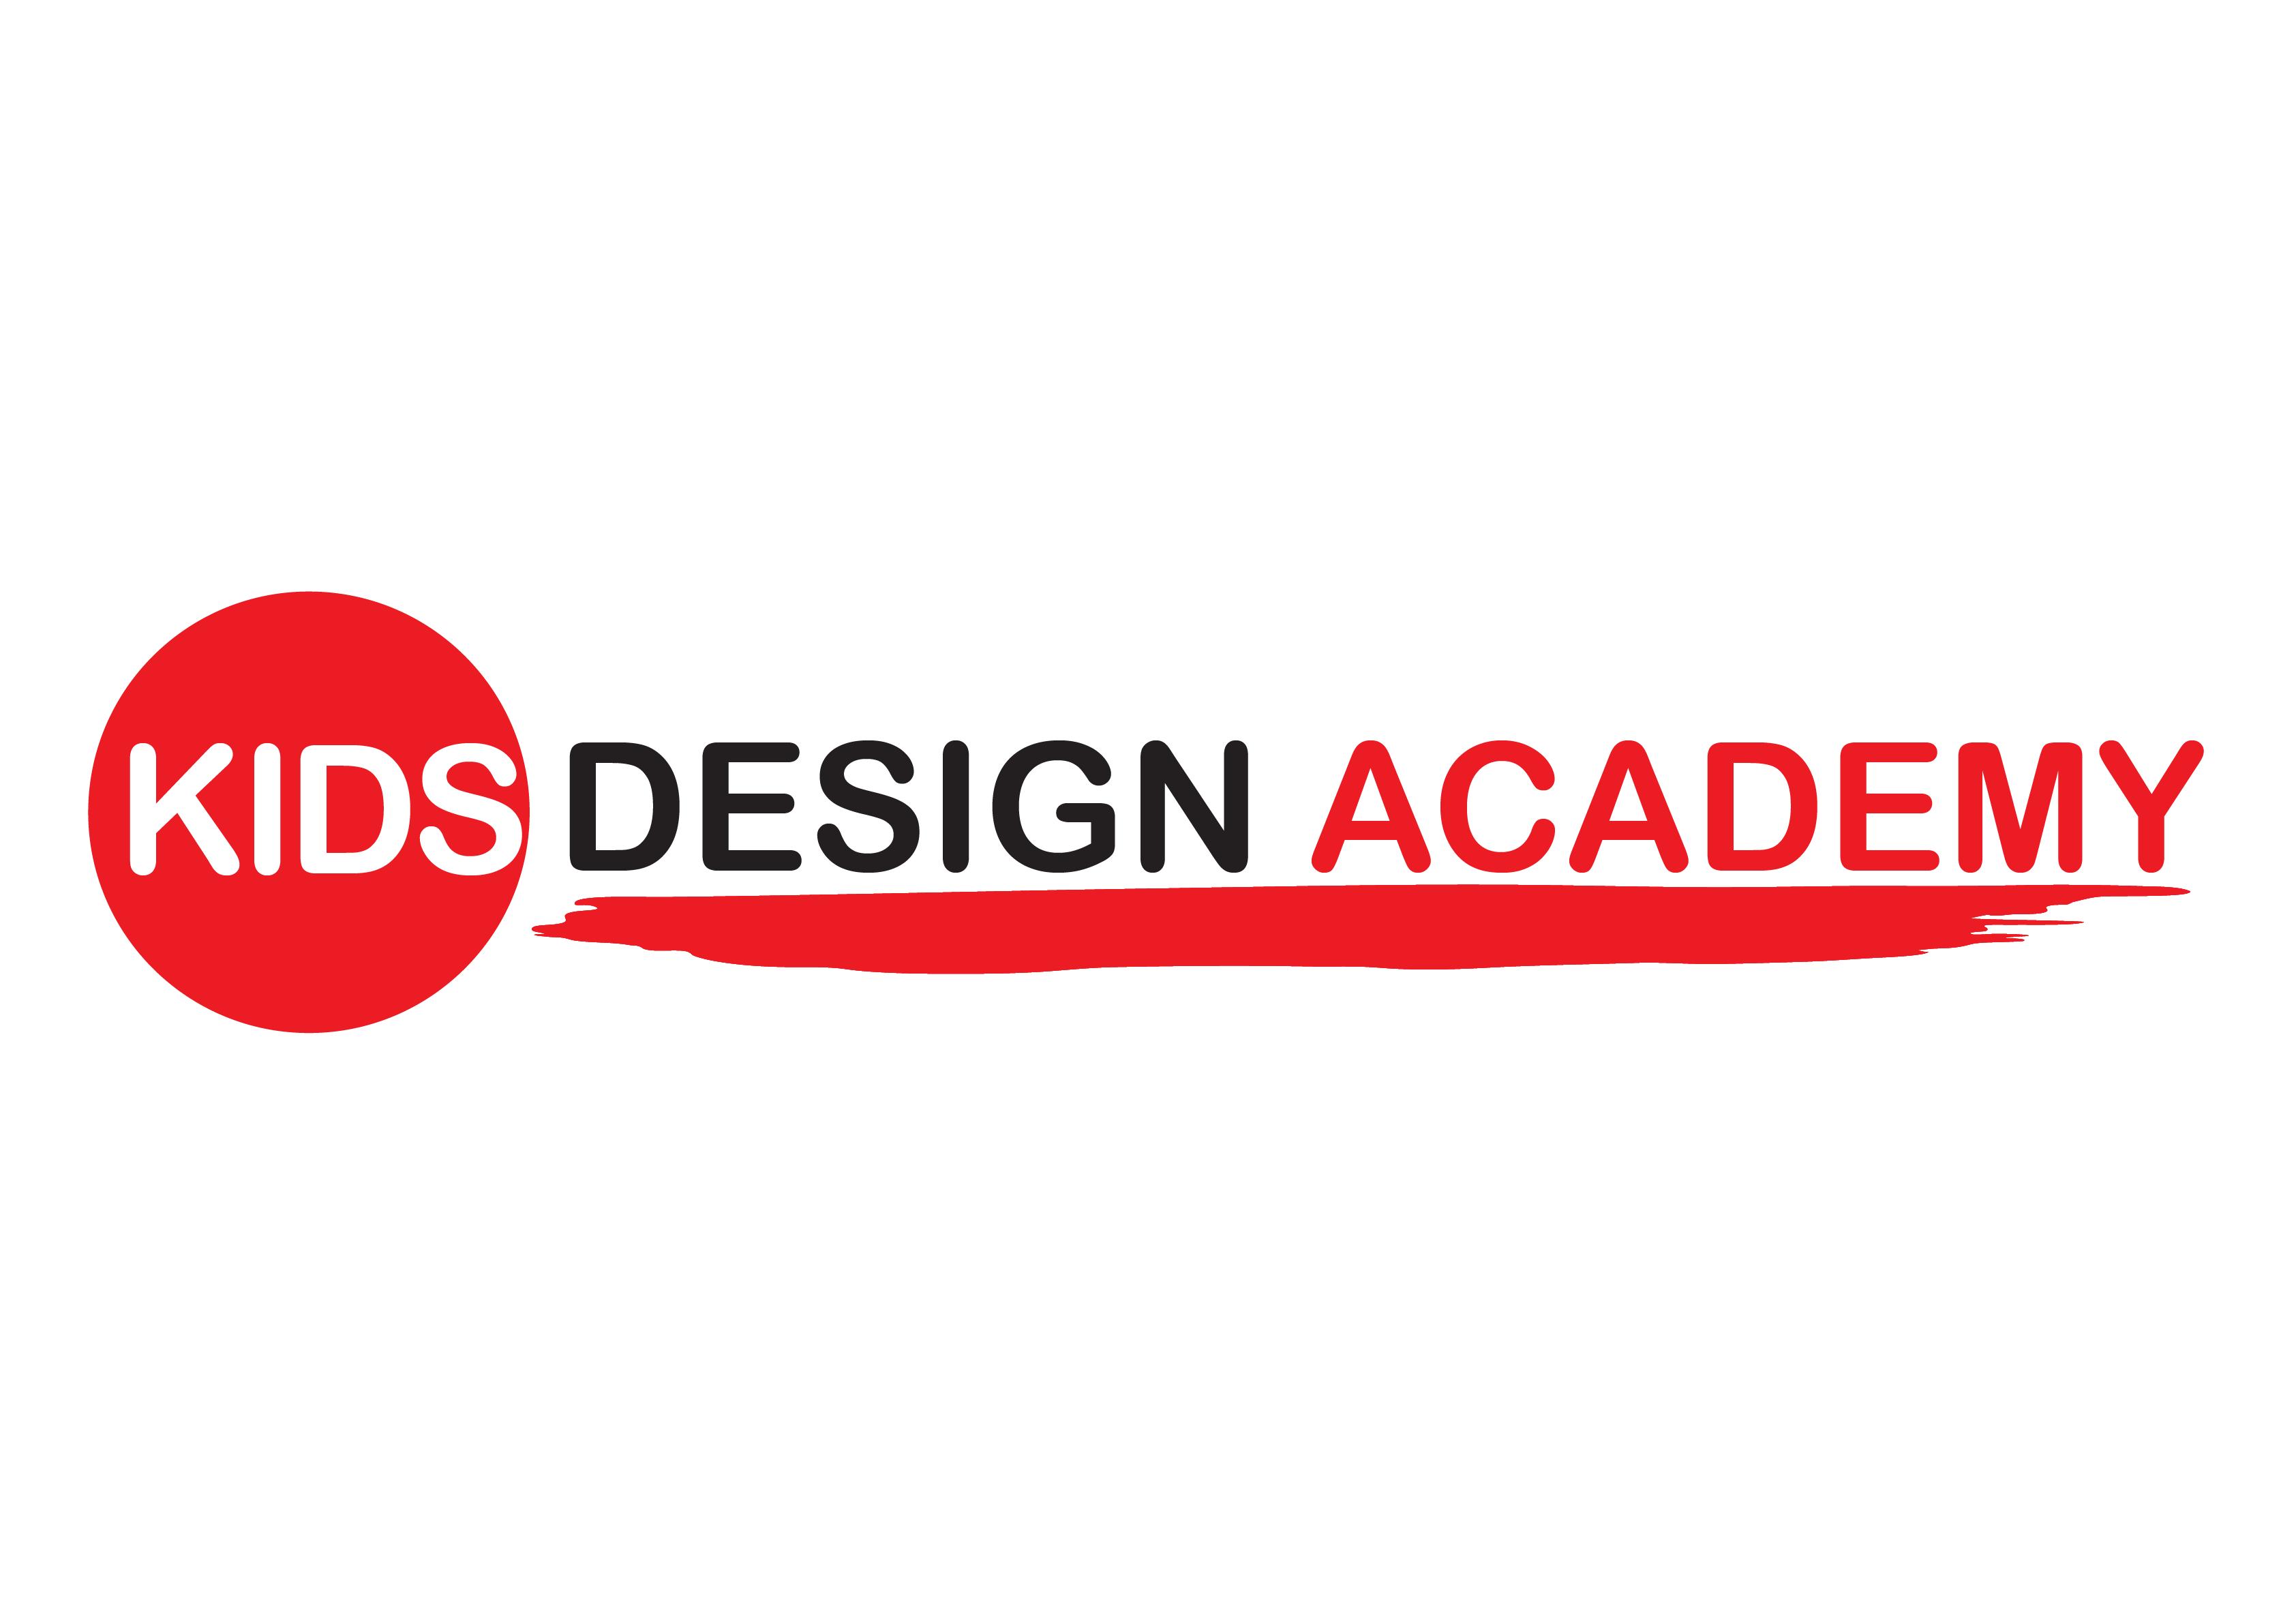 KIDS DESIGN ACADE